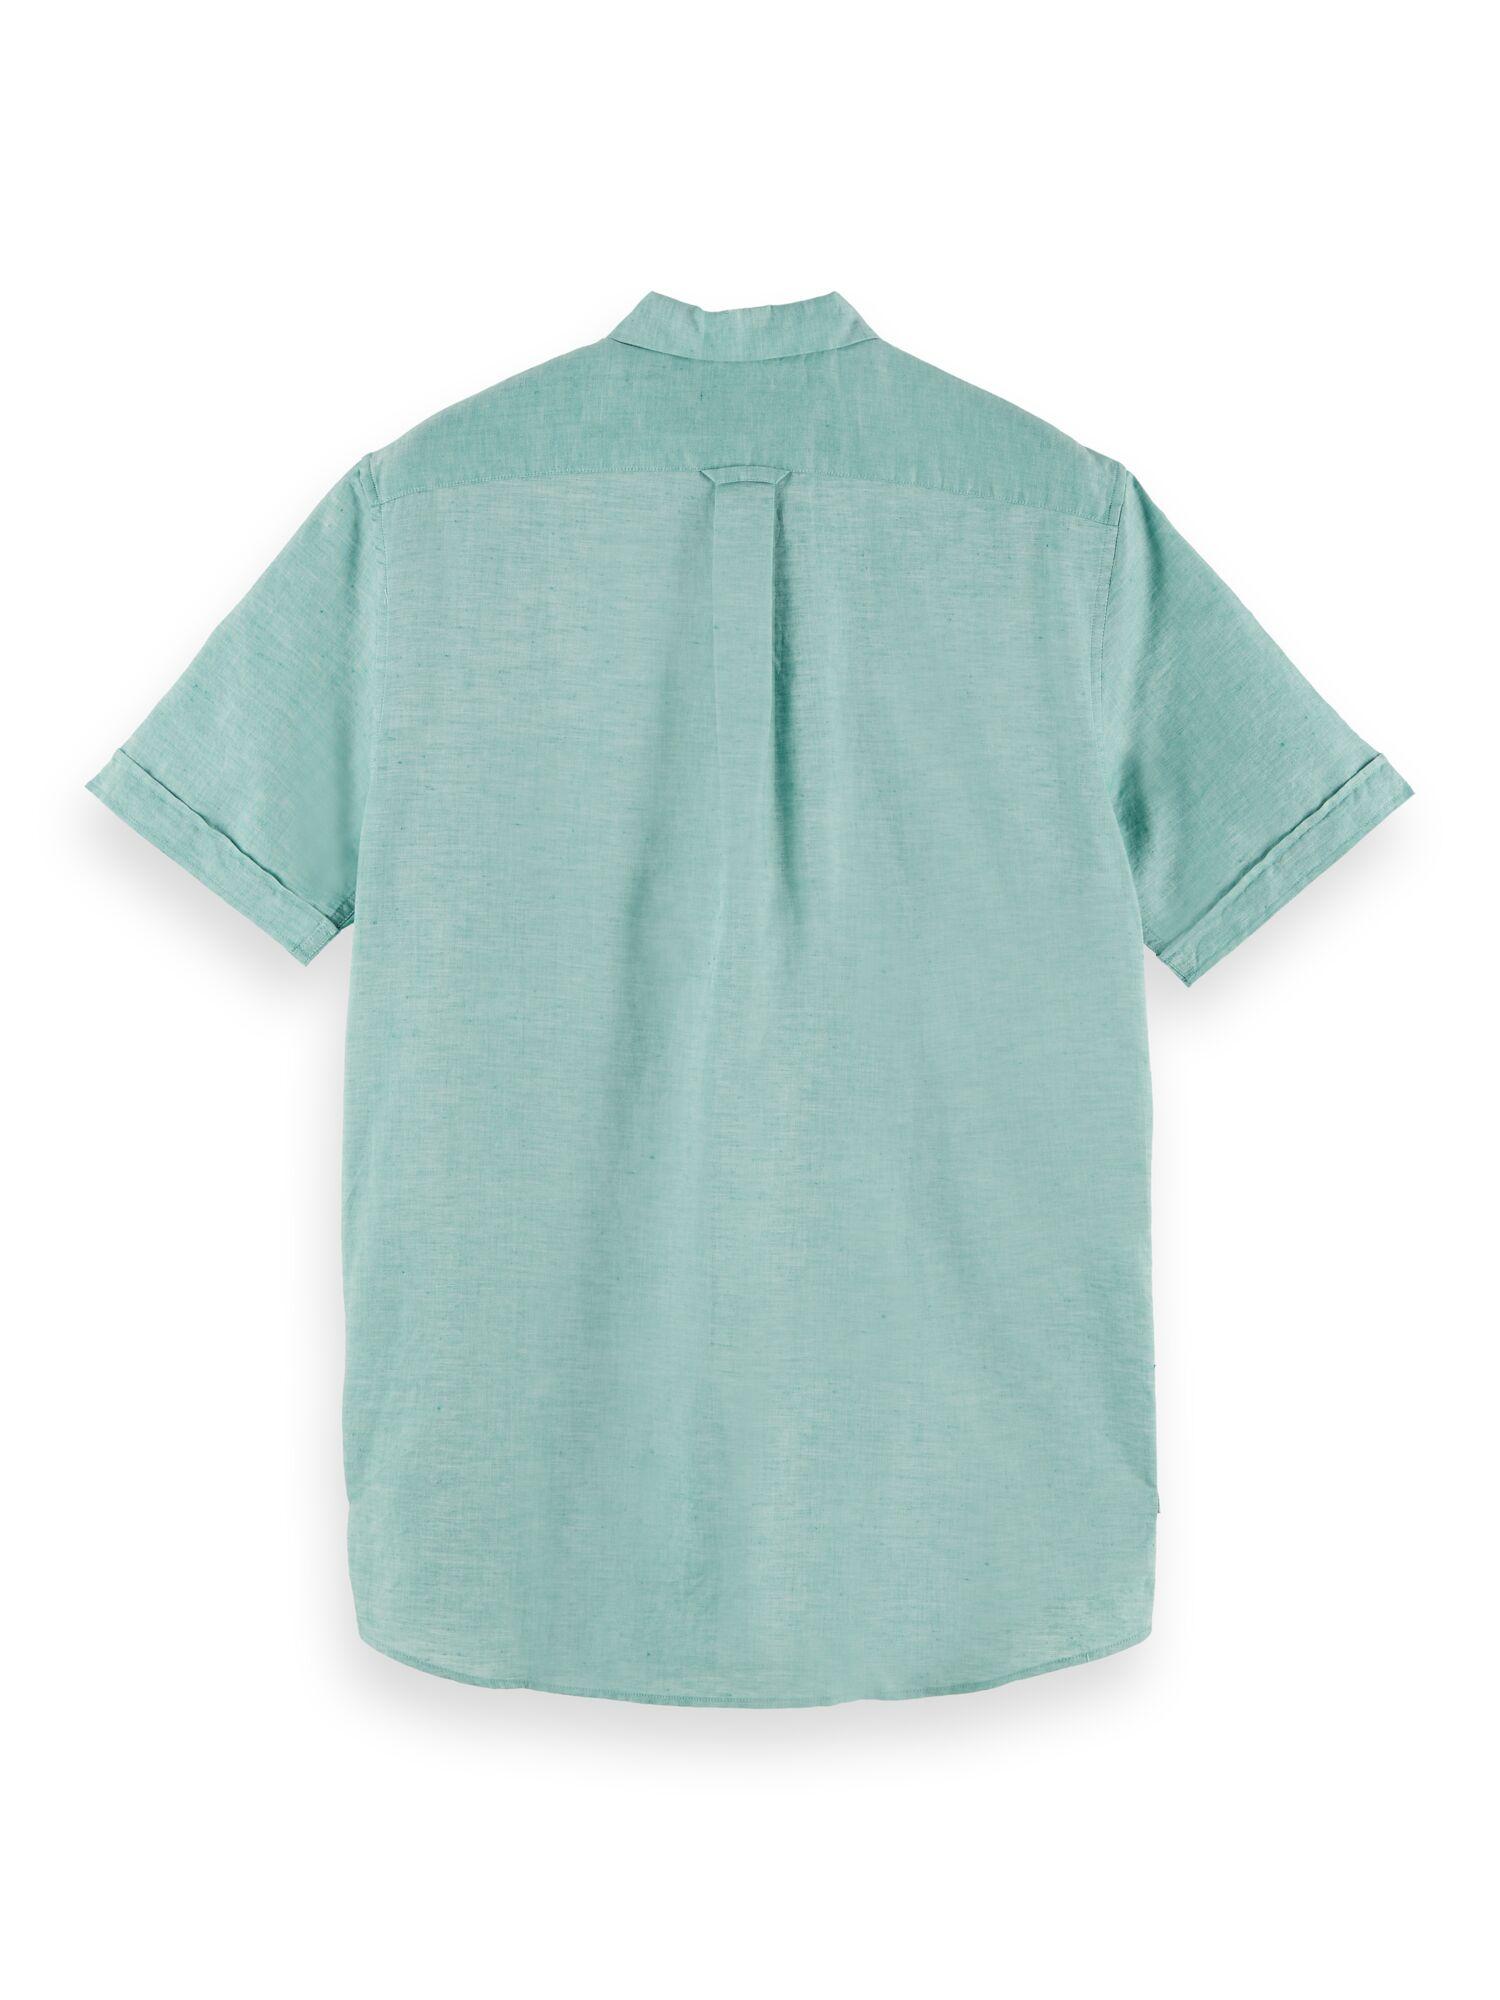 Scotch & Soda   Organic cotton blend short sleeve polo shirt